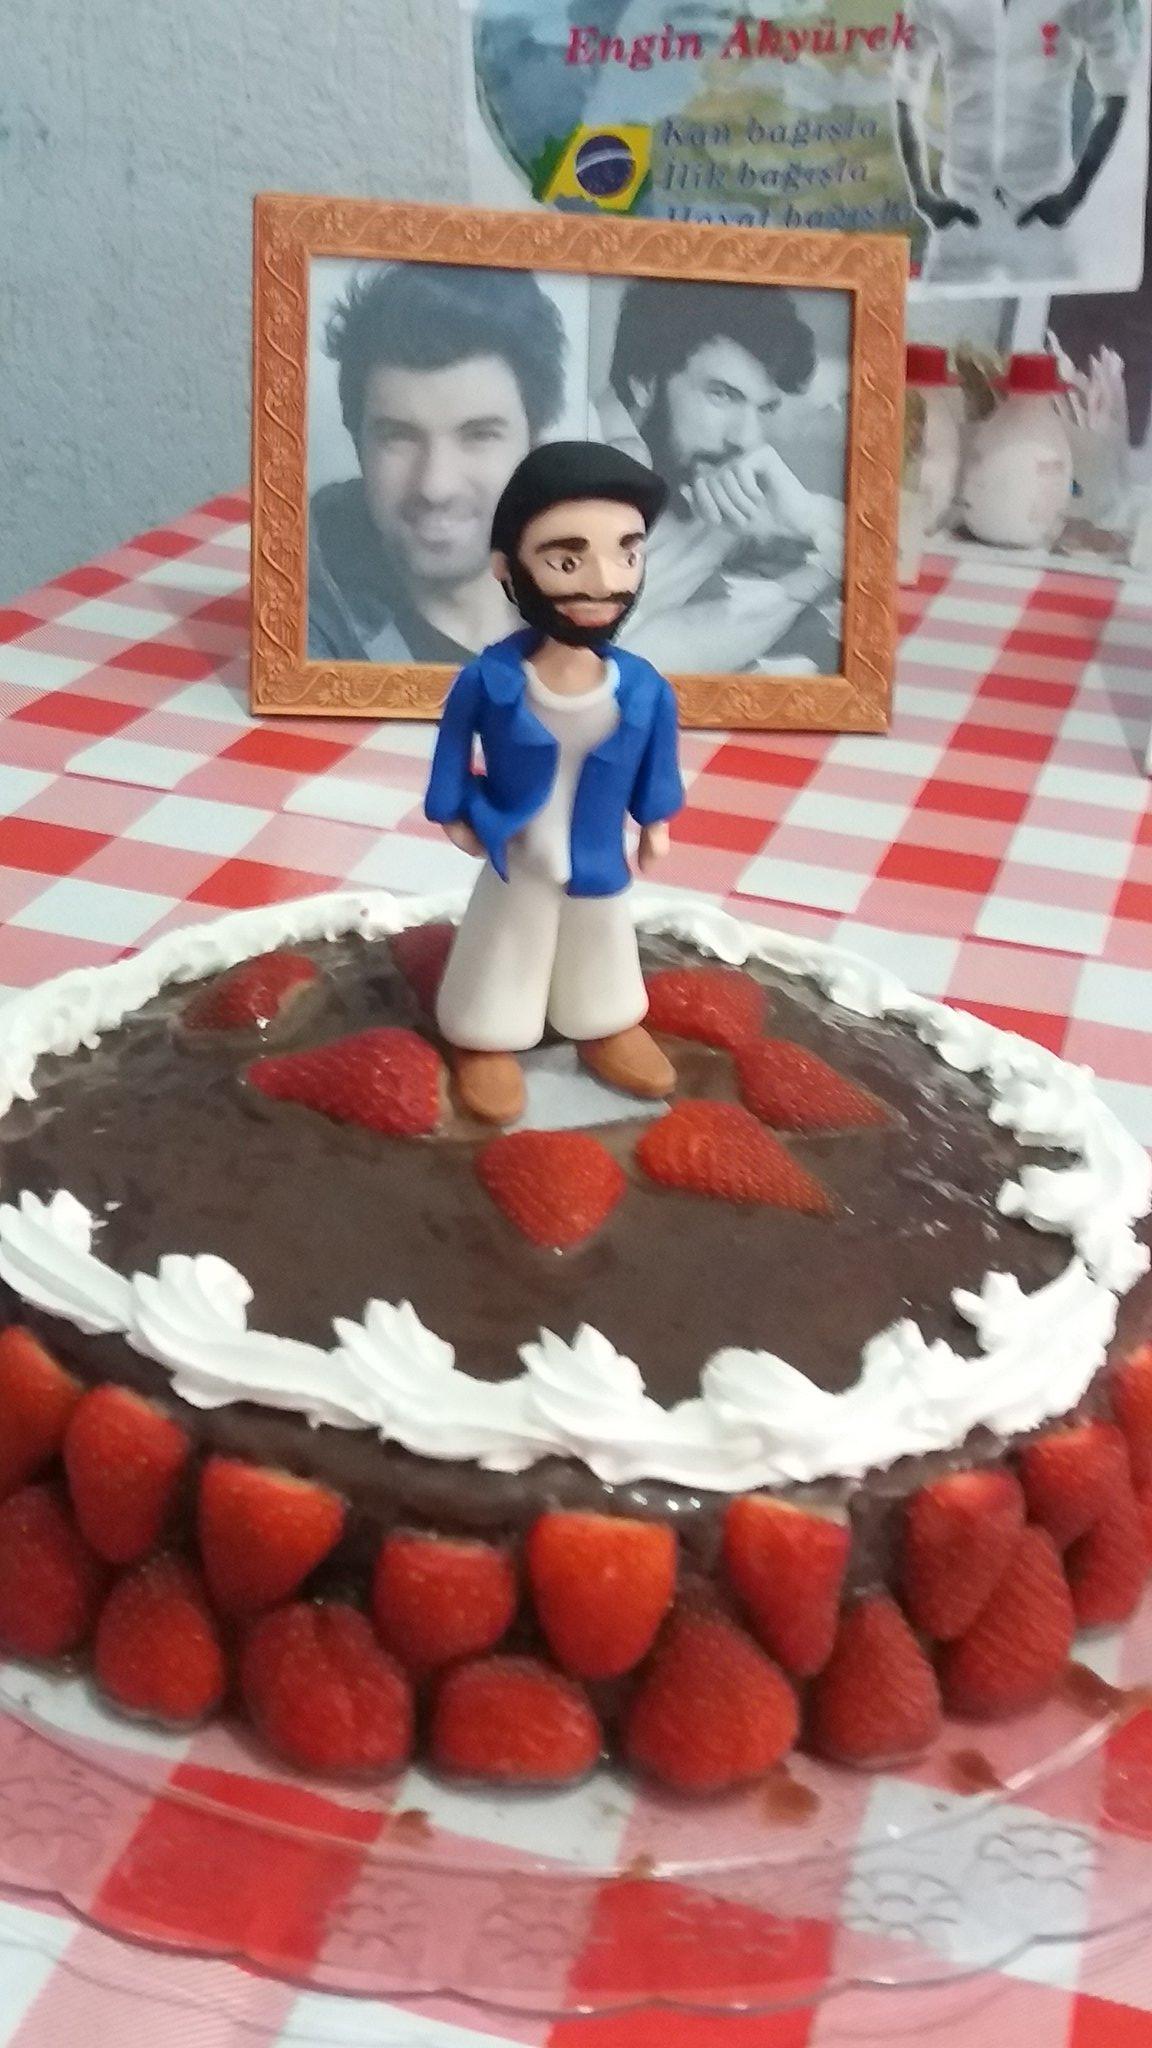 Na Turquia já é seu dia  Happy birthday Engin Akyurek